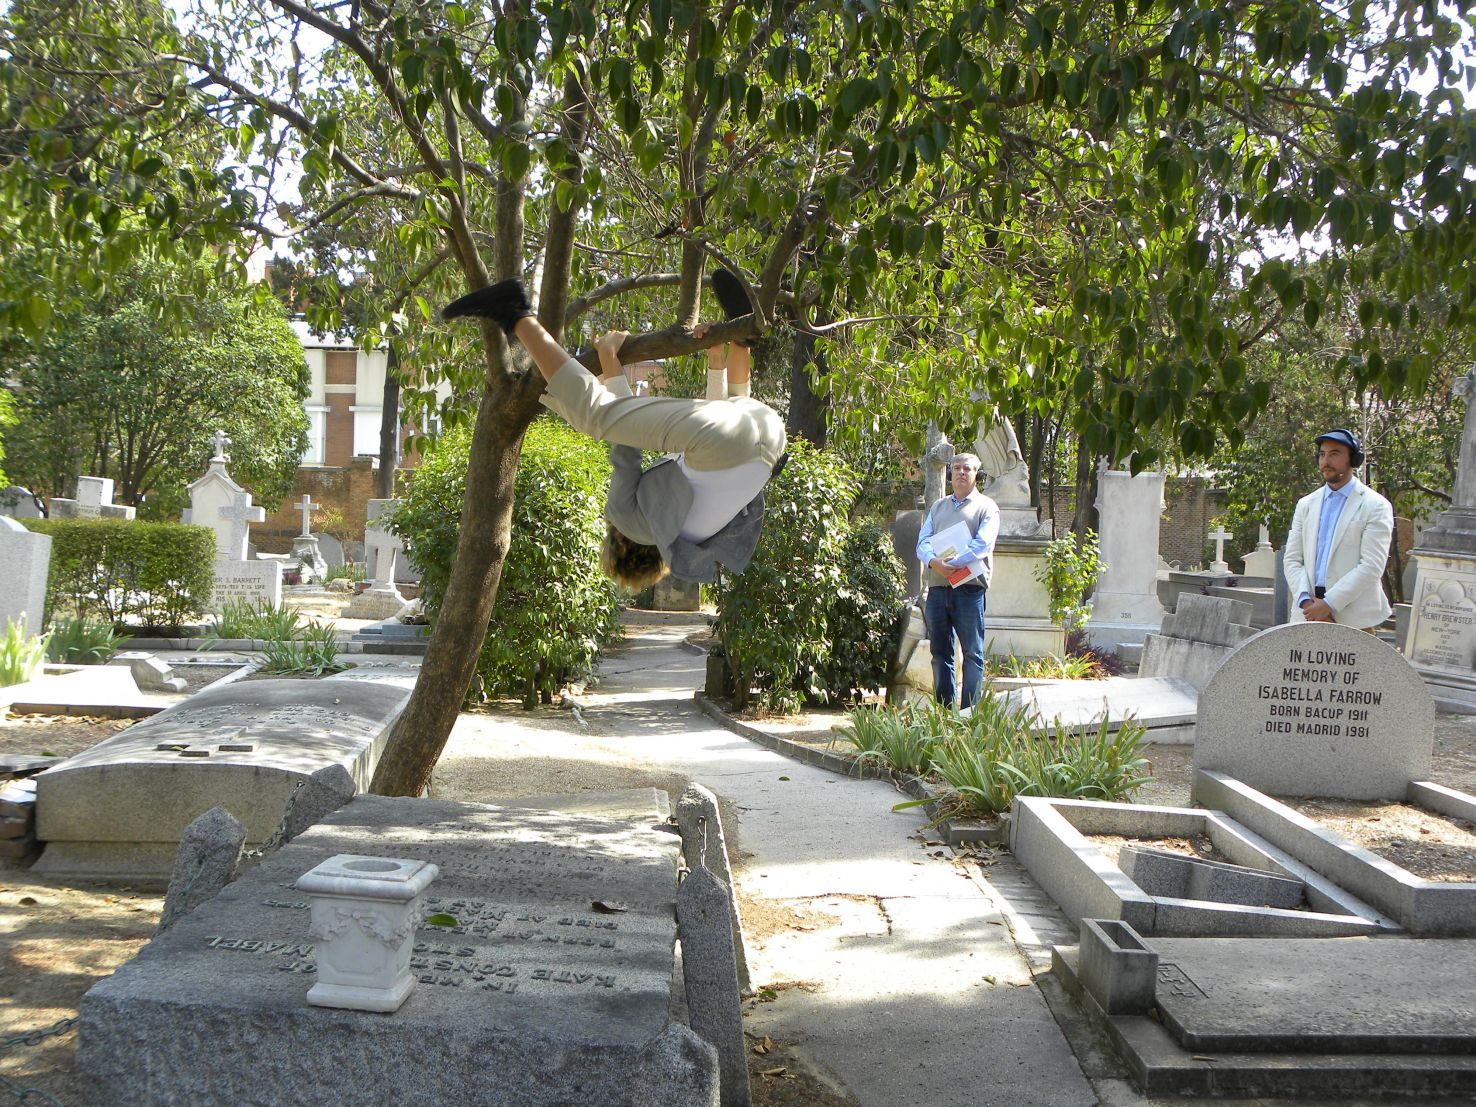 02_VisitaPriceCienAñosDespues(c)MadridDestino_AnaRojo.jpg